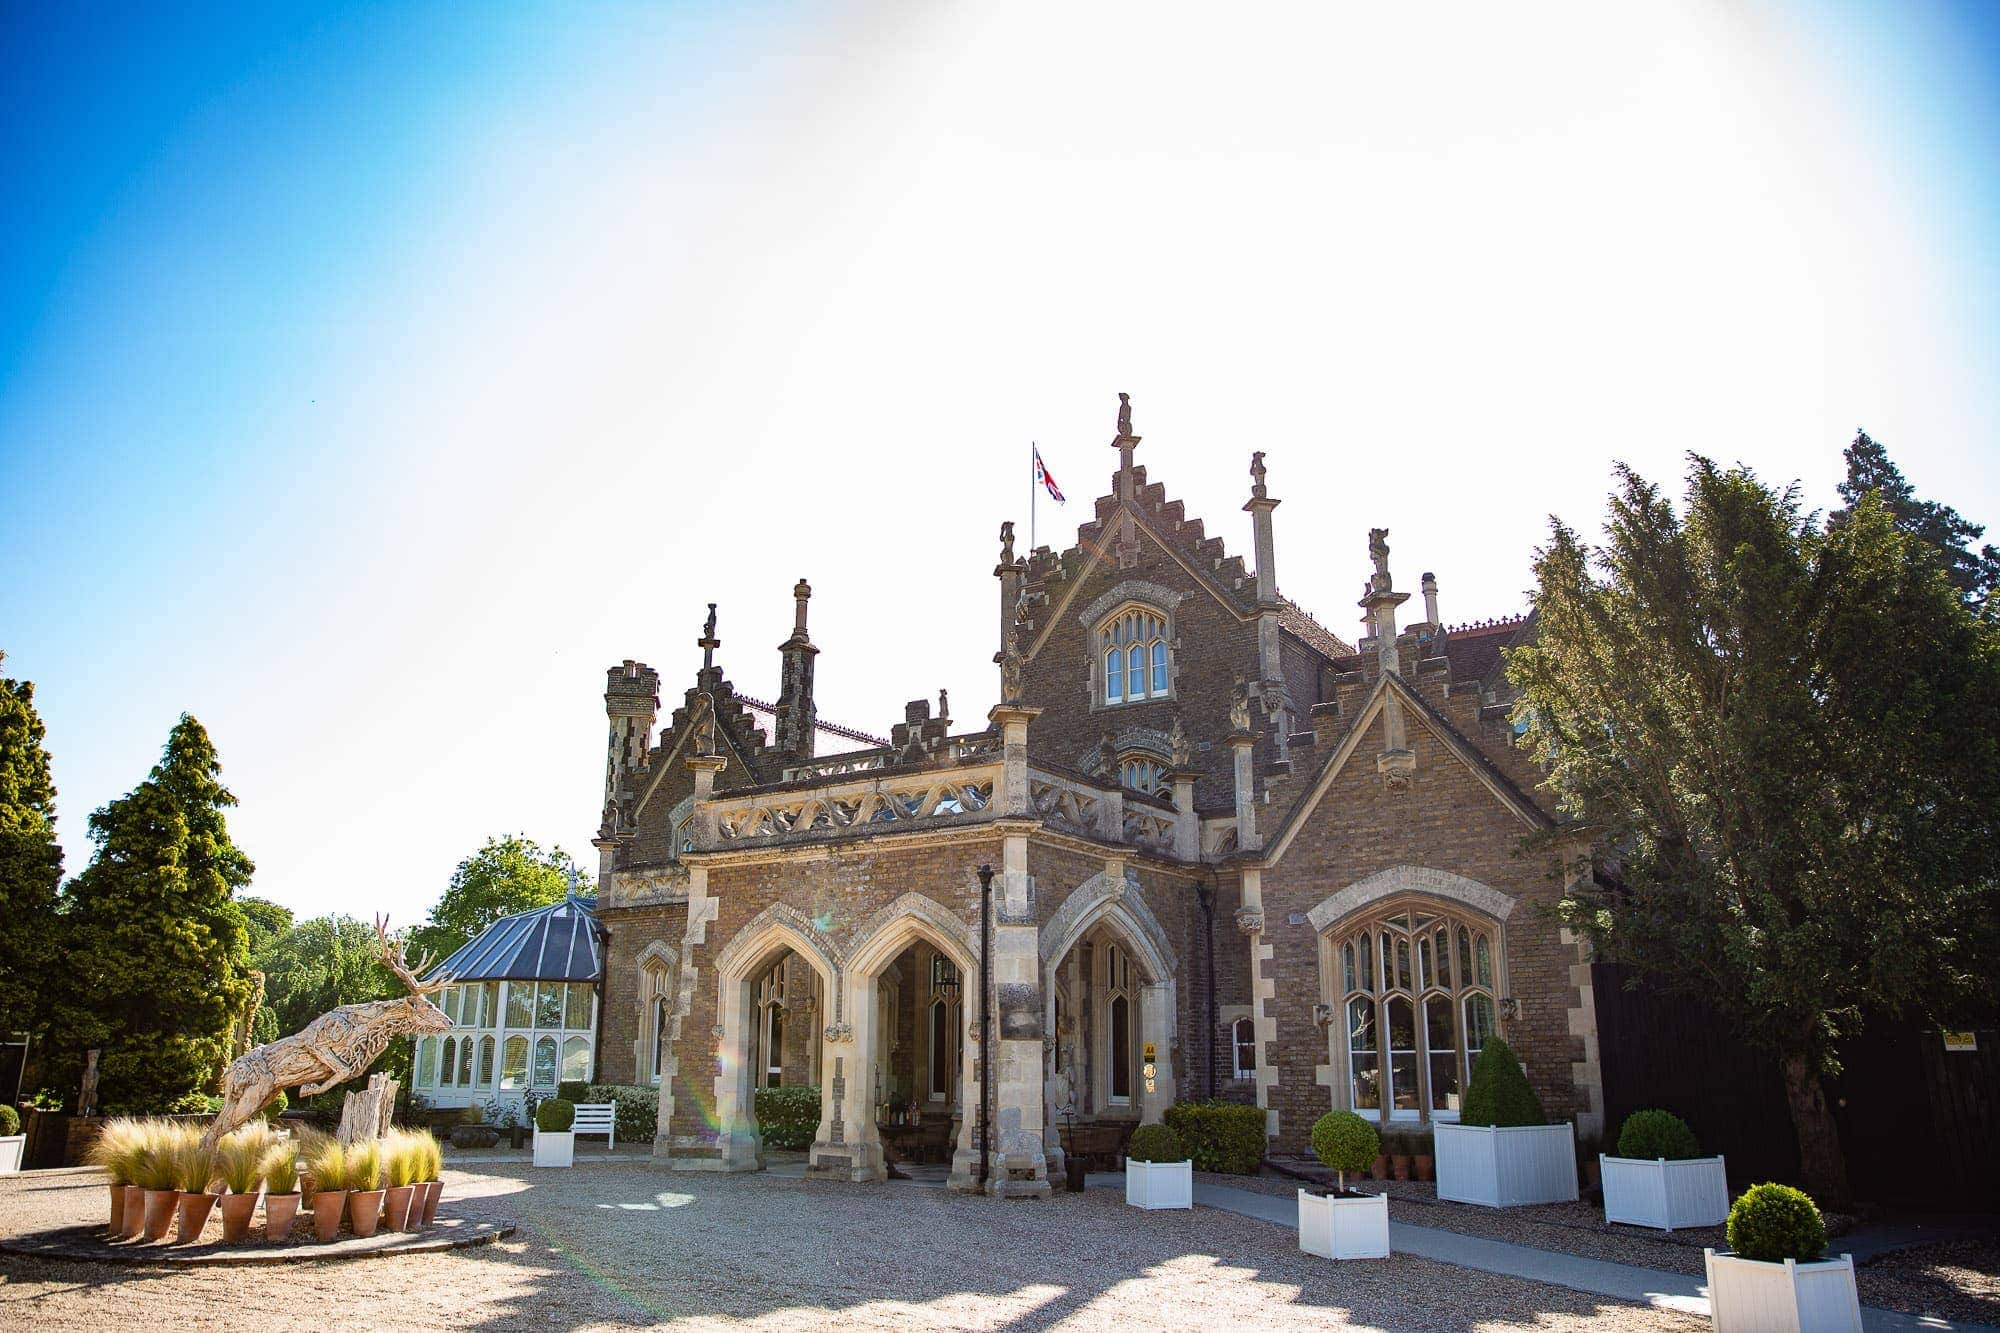 Oakley Court Wedding Venue in Berkshire - Front Entrance